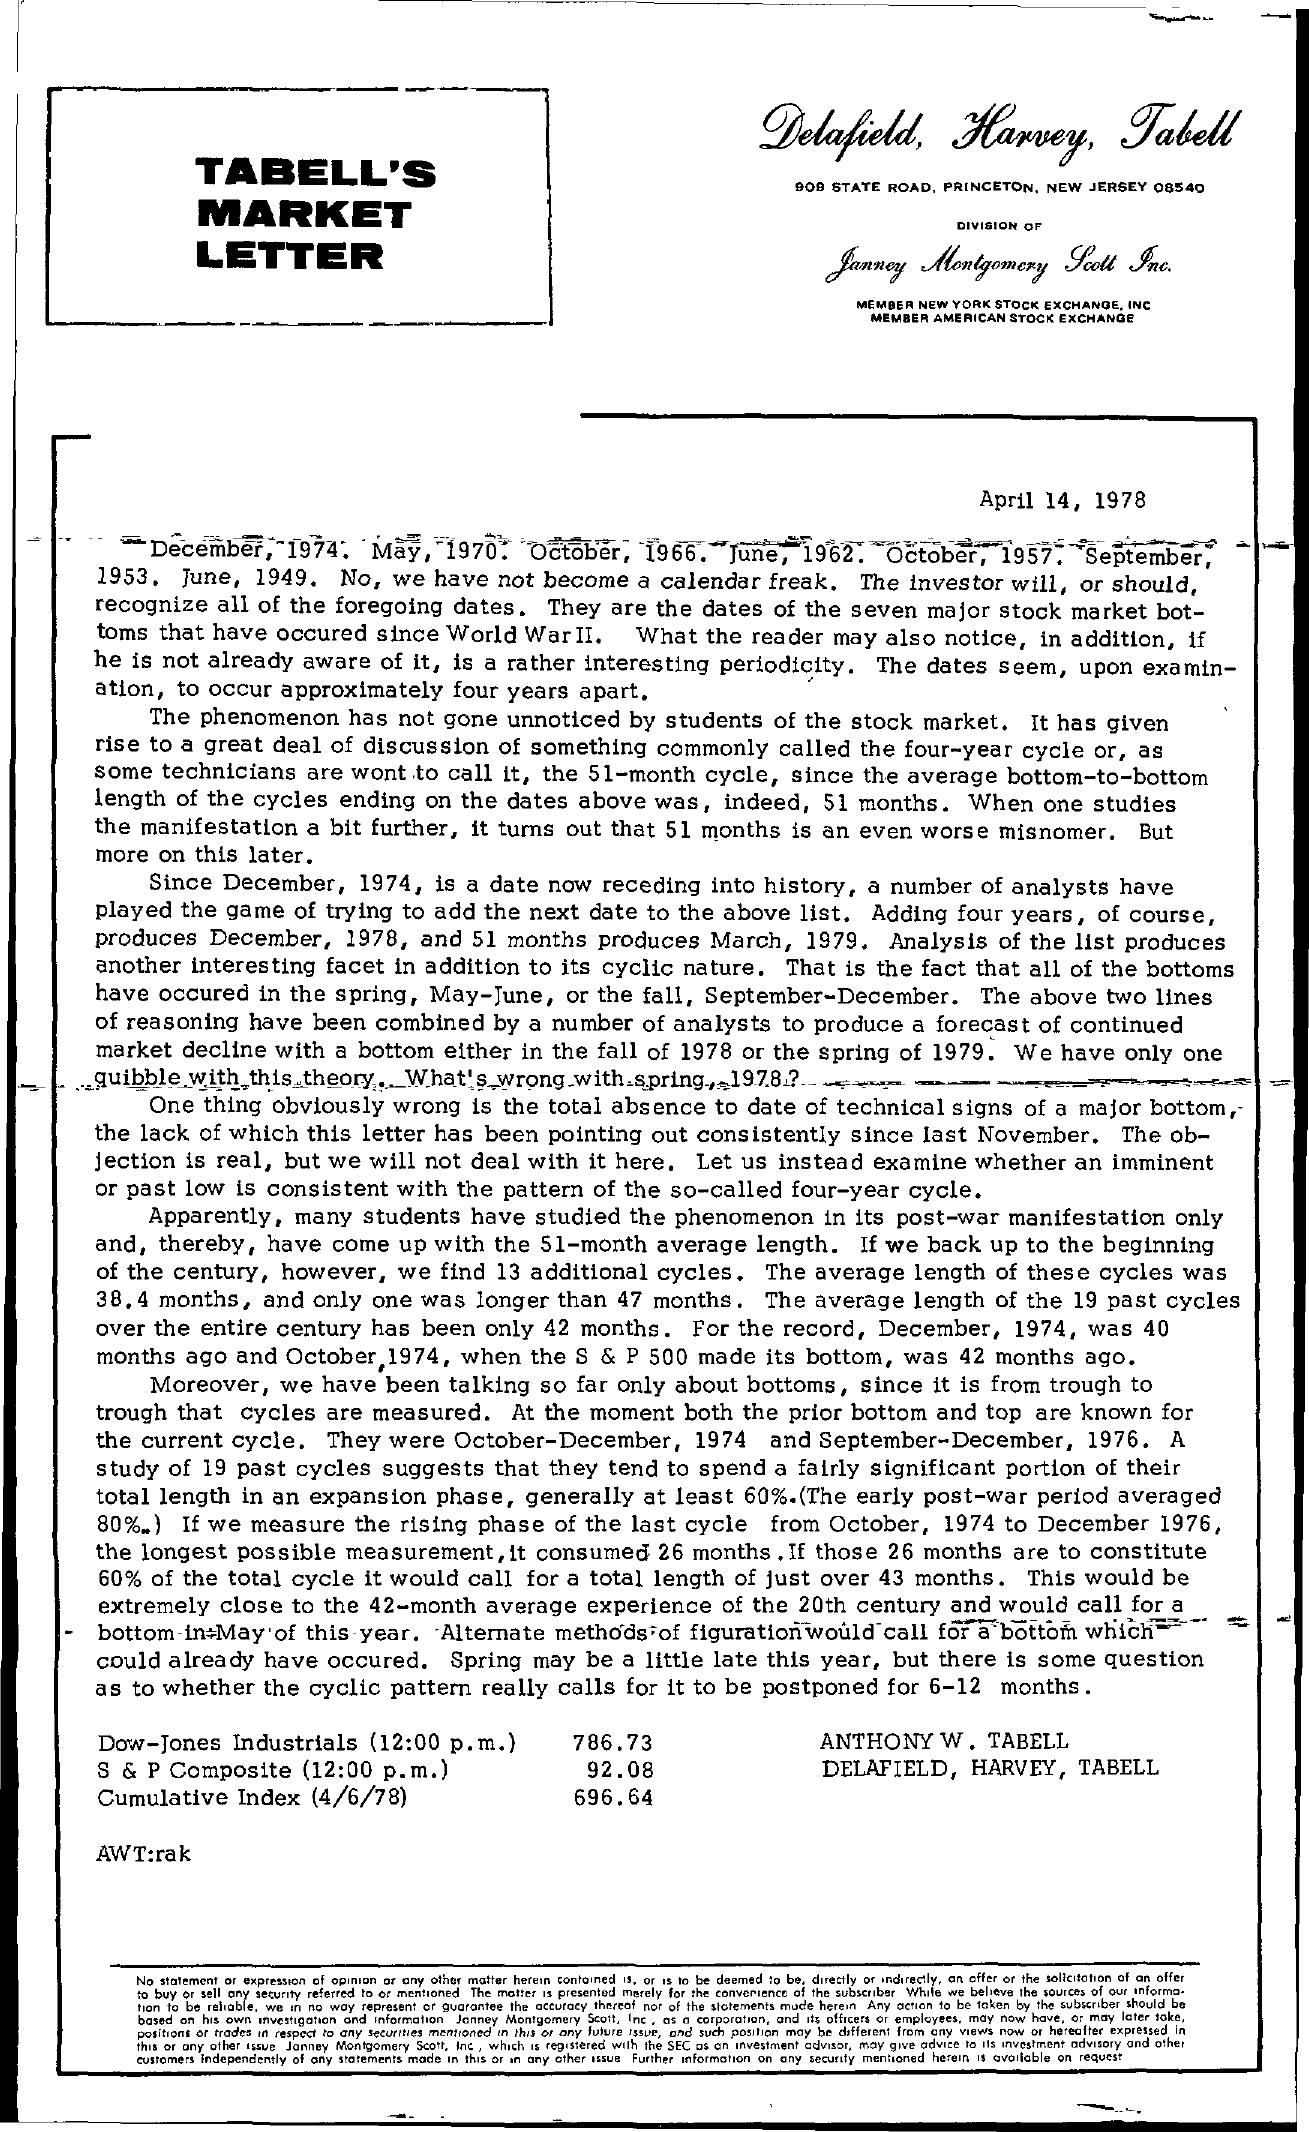 Tabell's Market Letter - April 14, 1978